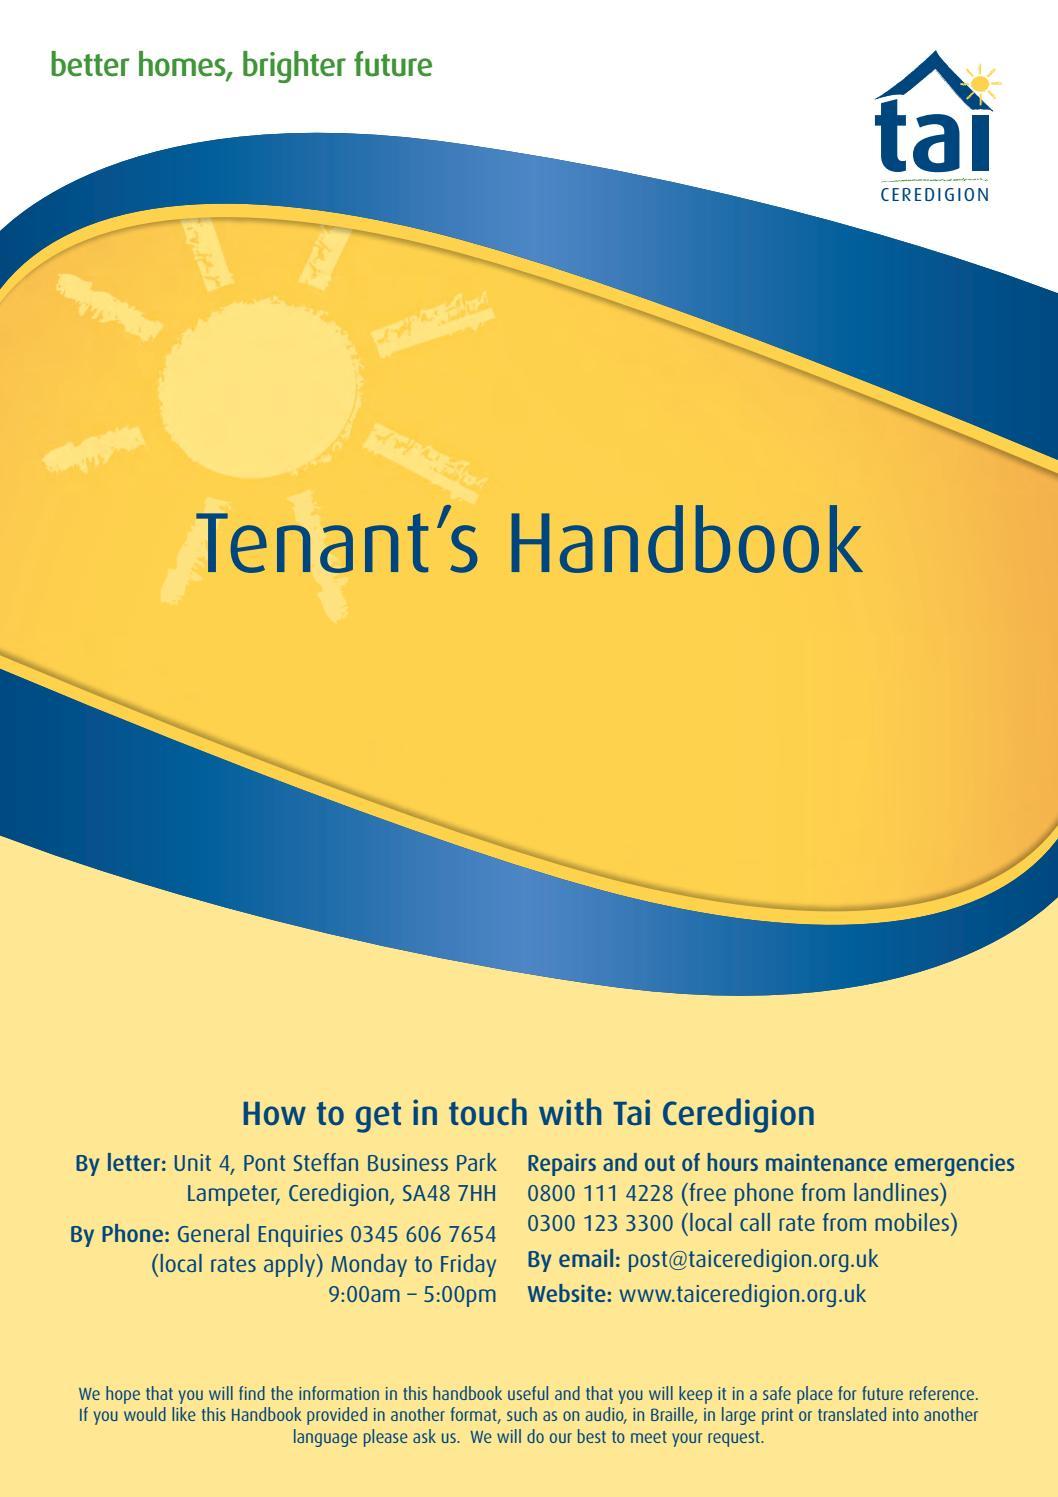 Tai Ceredigion Tenants Handbook By Tai Ceredigion Issuu